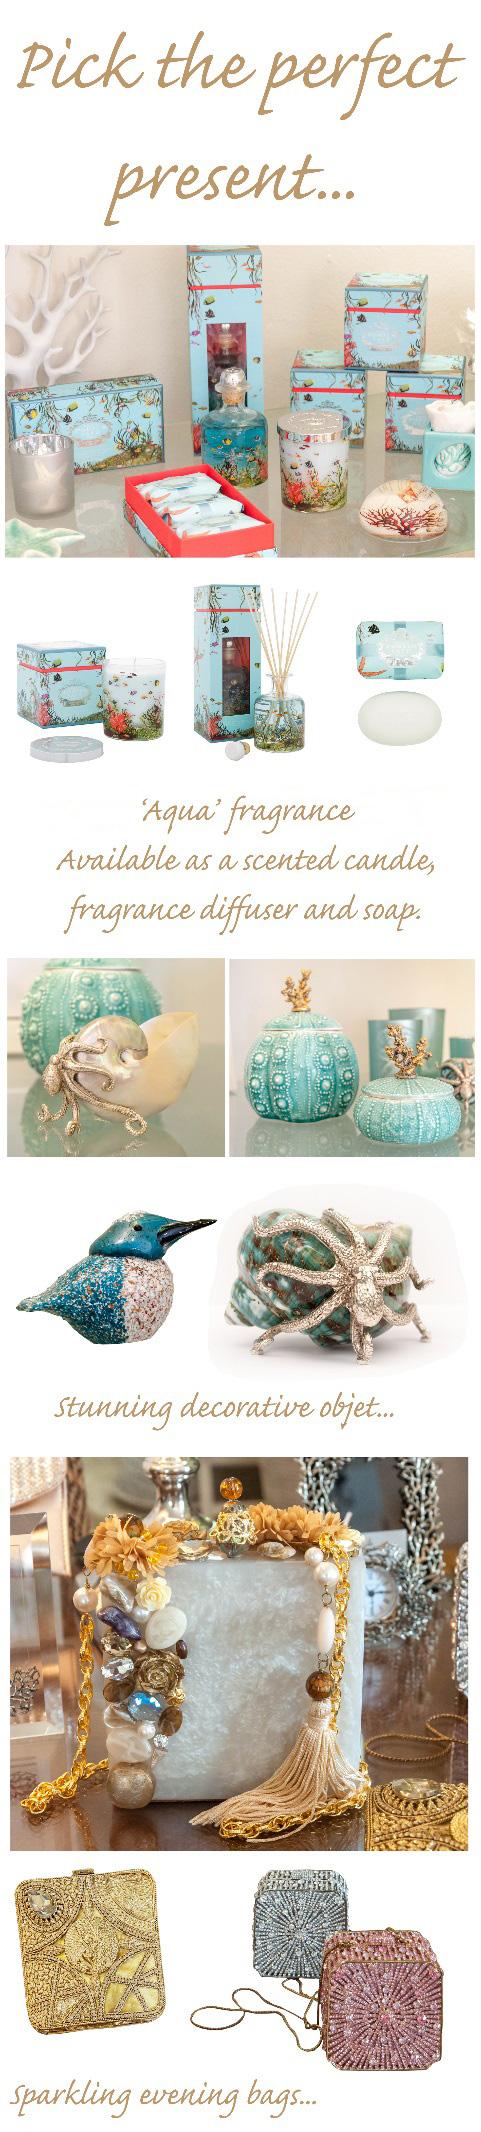 Jenny Blanc Blog - Pick the Perfect Present